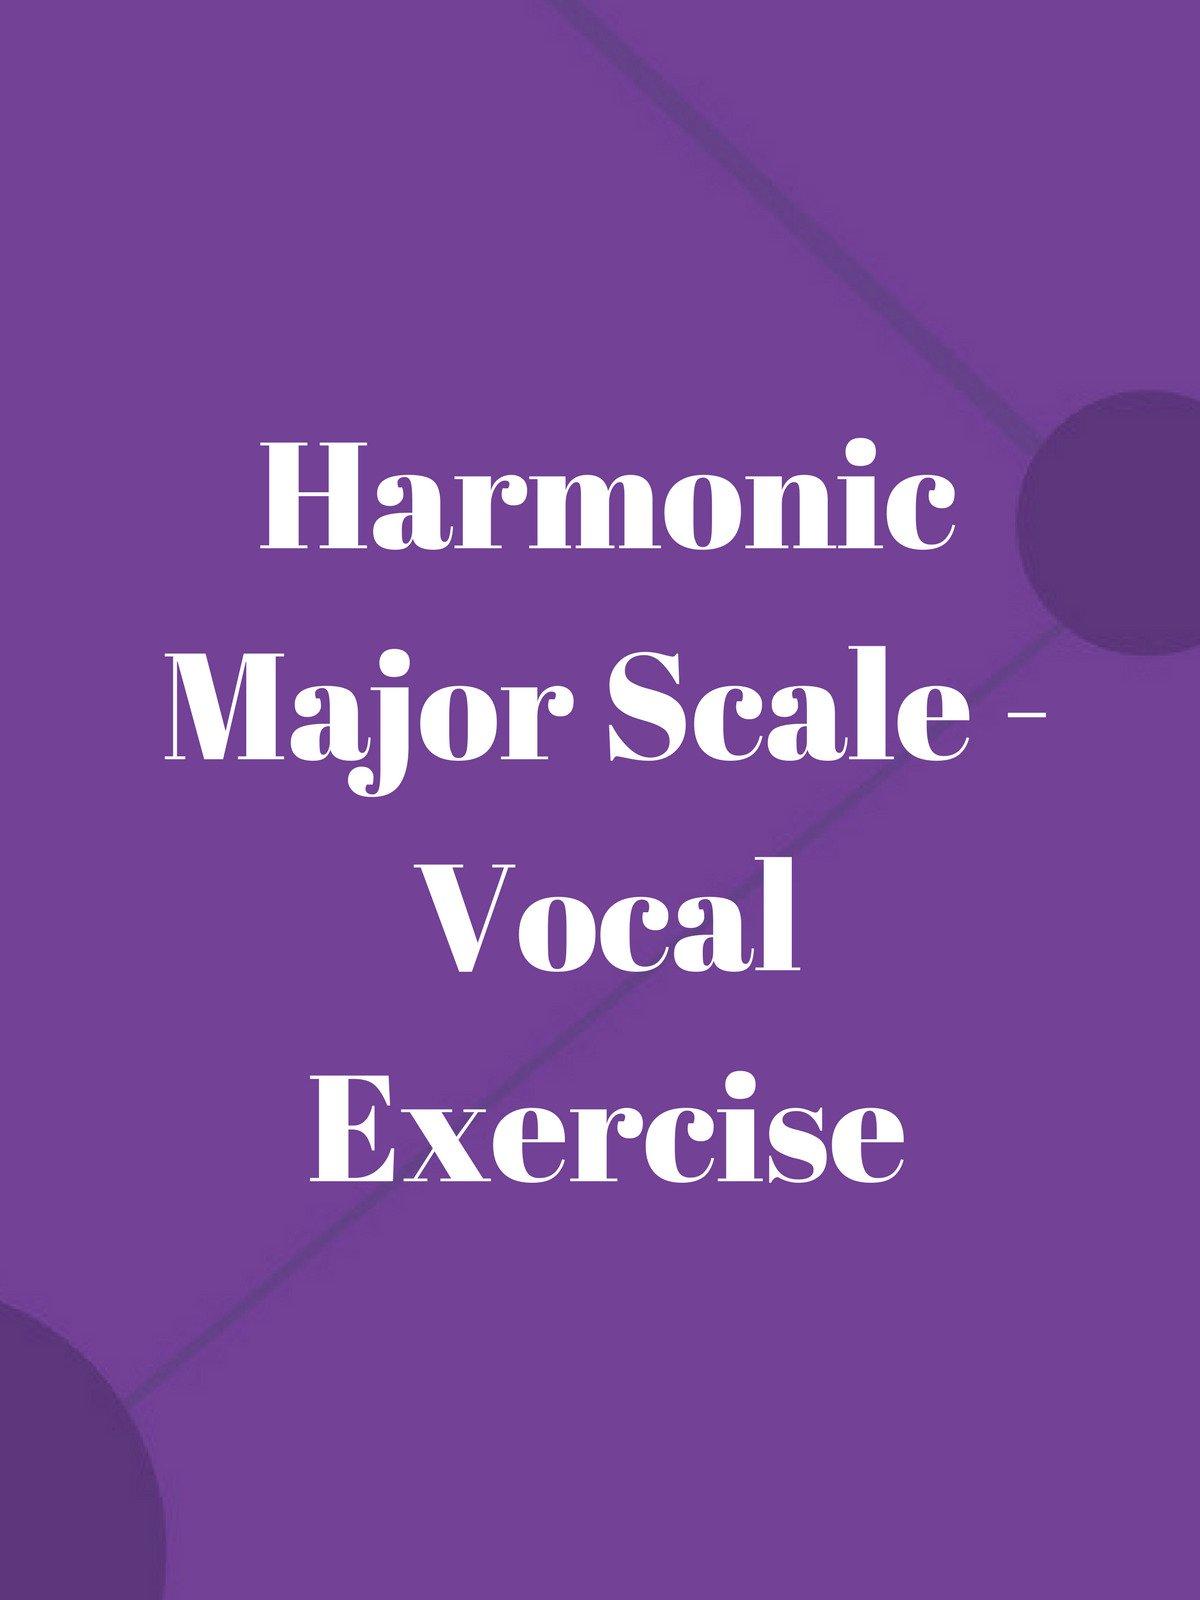 Harmonic Major Scale